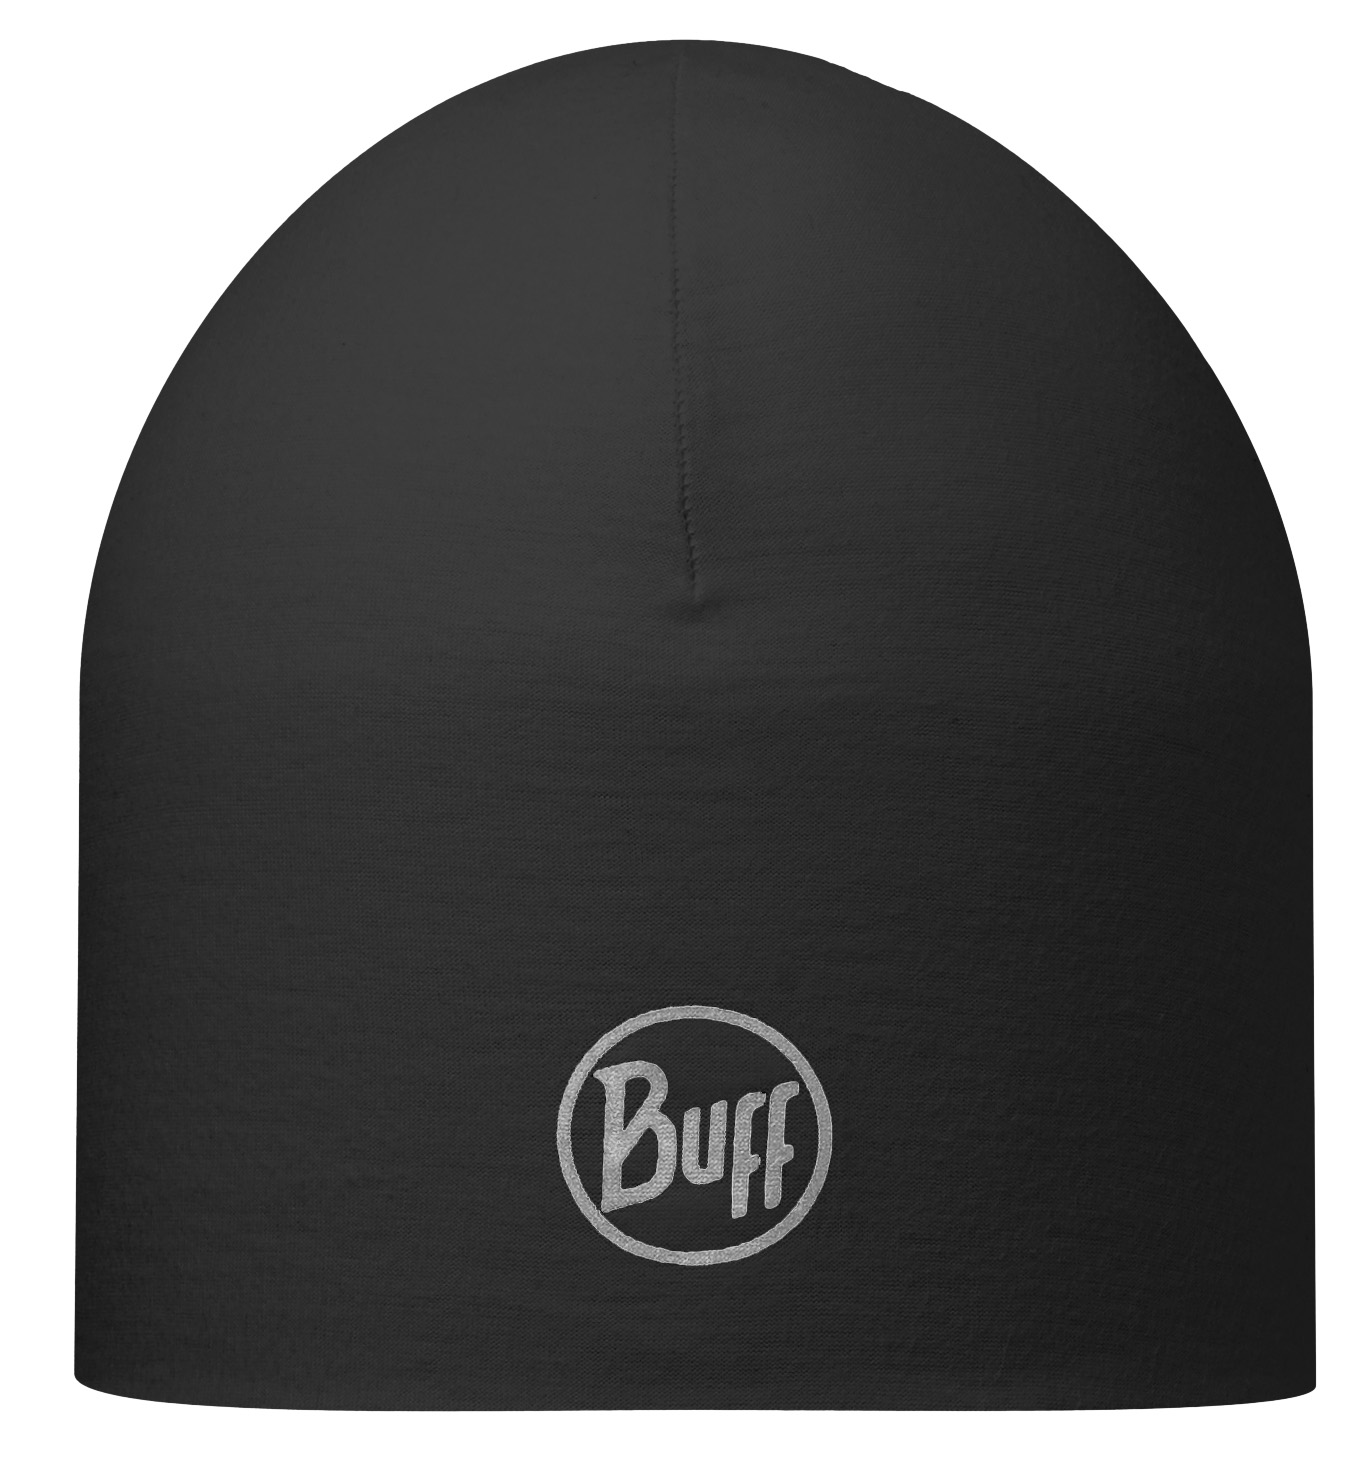 Купить Шапка BUFF Coolmax REVERSIBLE COOLMAX HAT R-SOLID BLACK Банданы и шарфы Buff ® 1185677